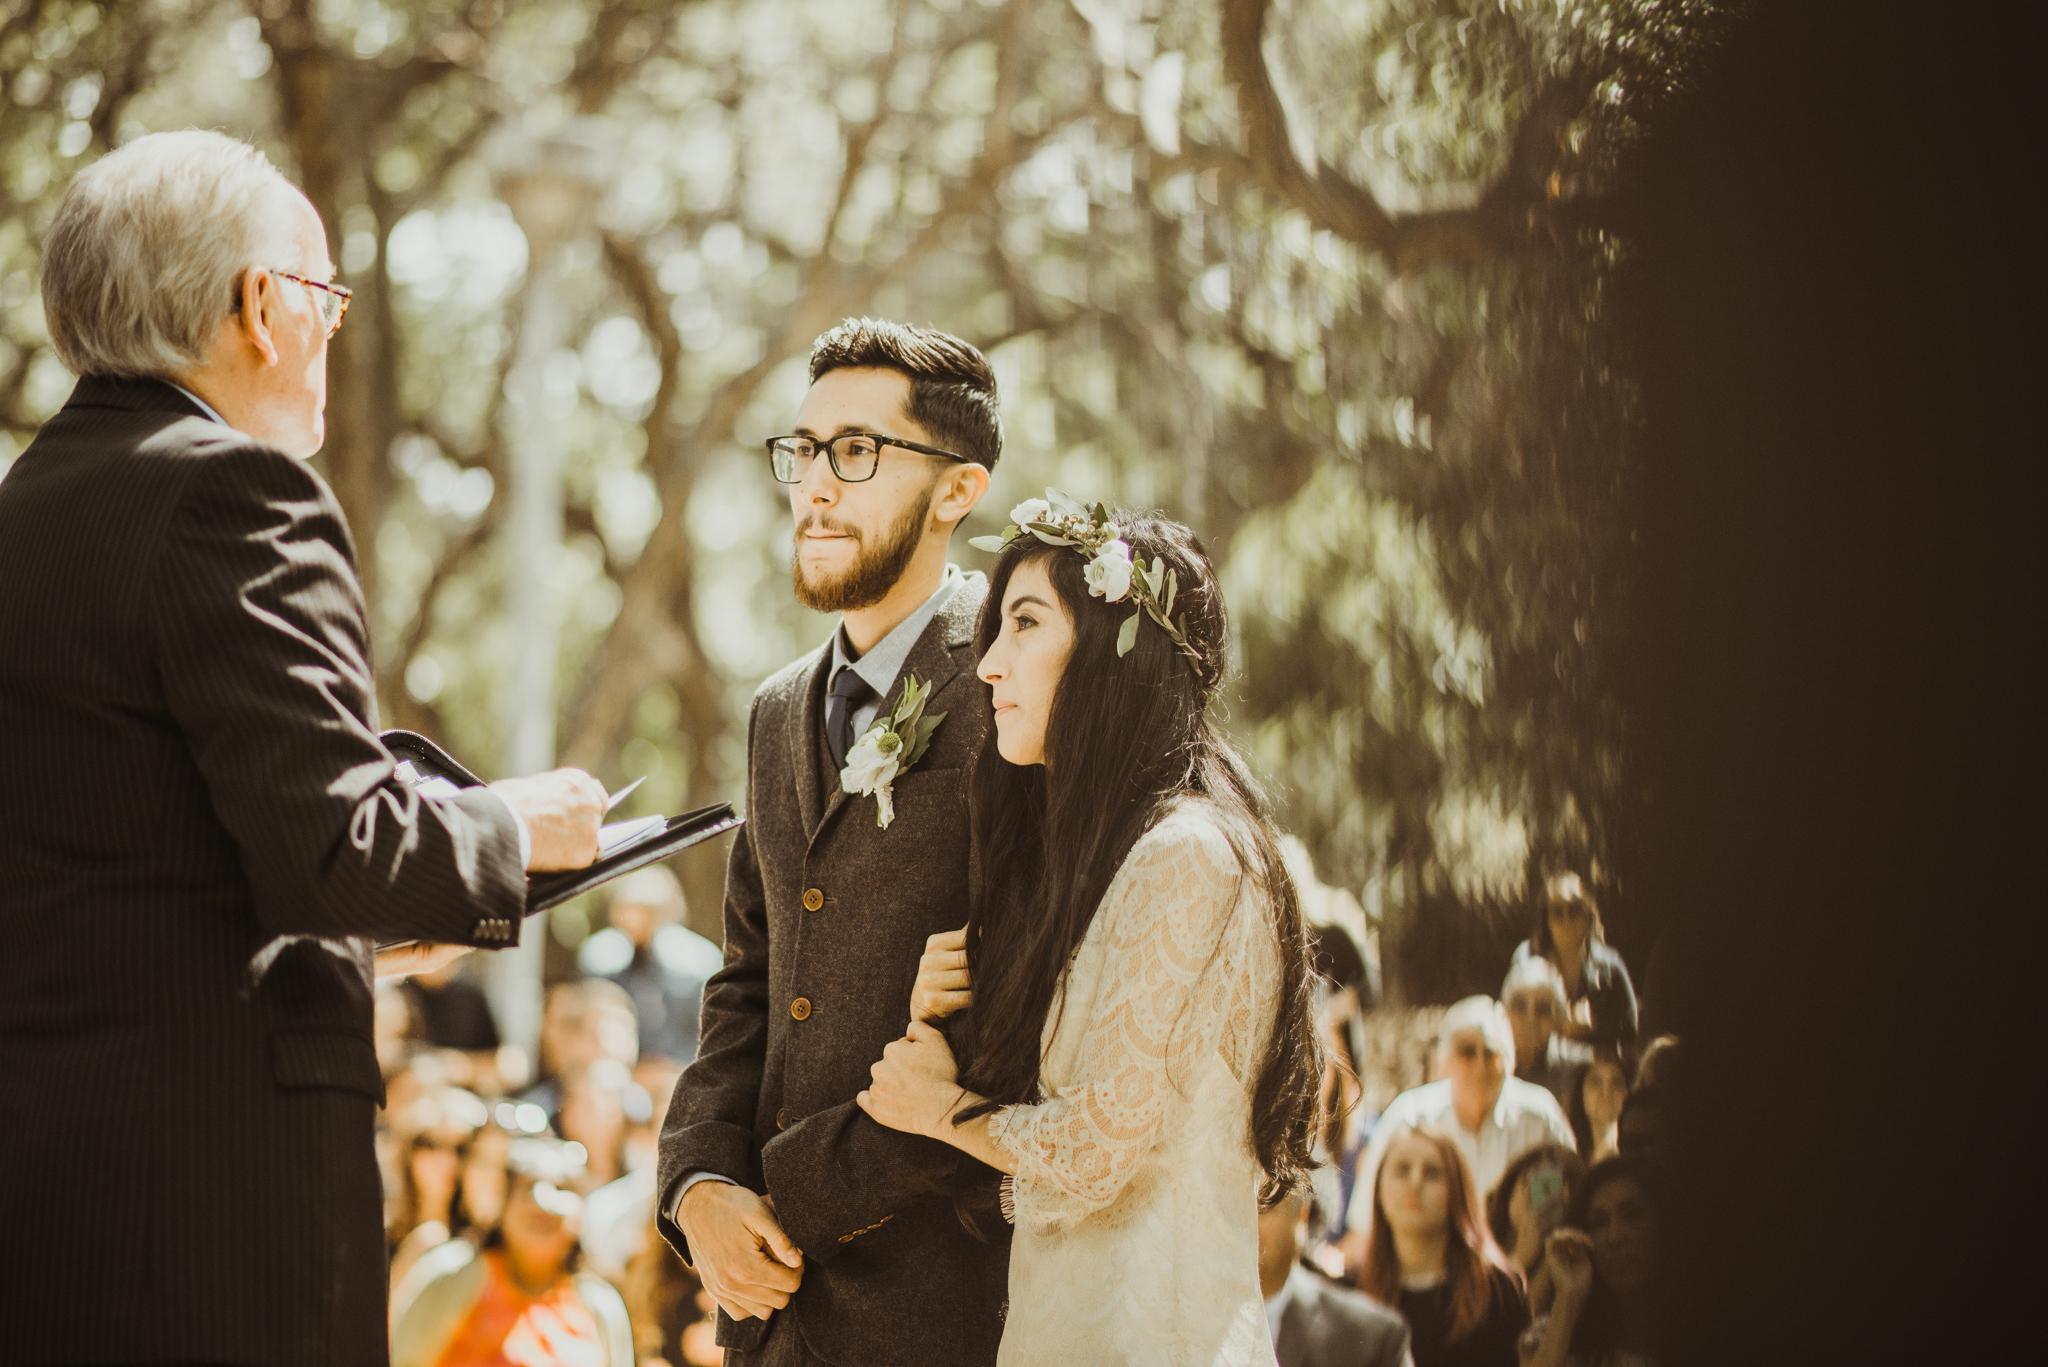 ©Isaiah-&-Taylor-Photography---Oak-Canyon-Nature-Center-Wedding,-Anaheim-Hills-045.jpg